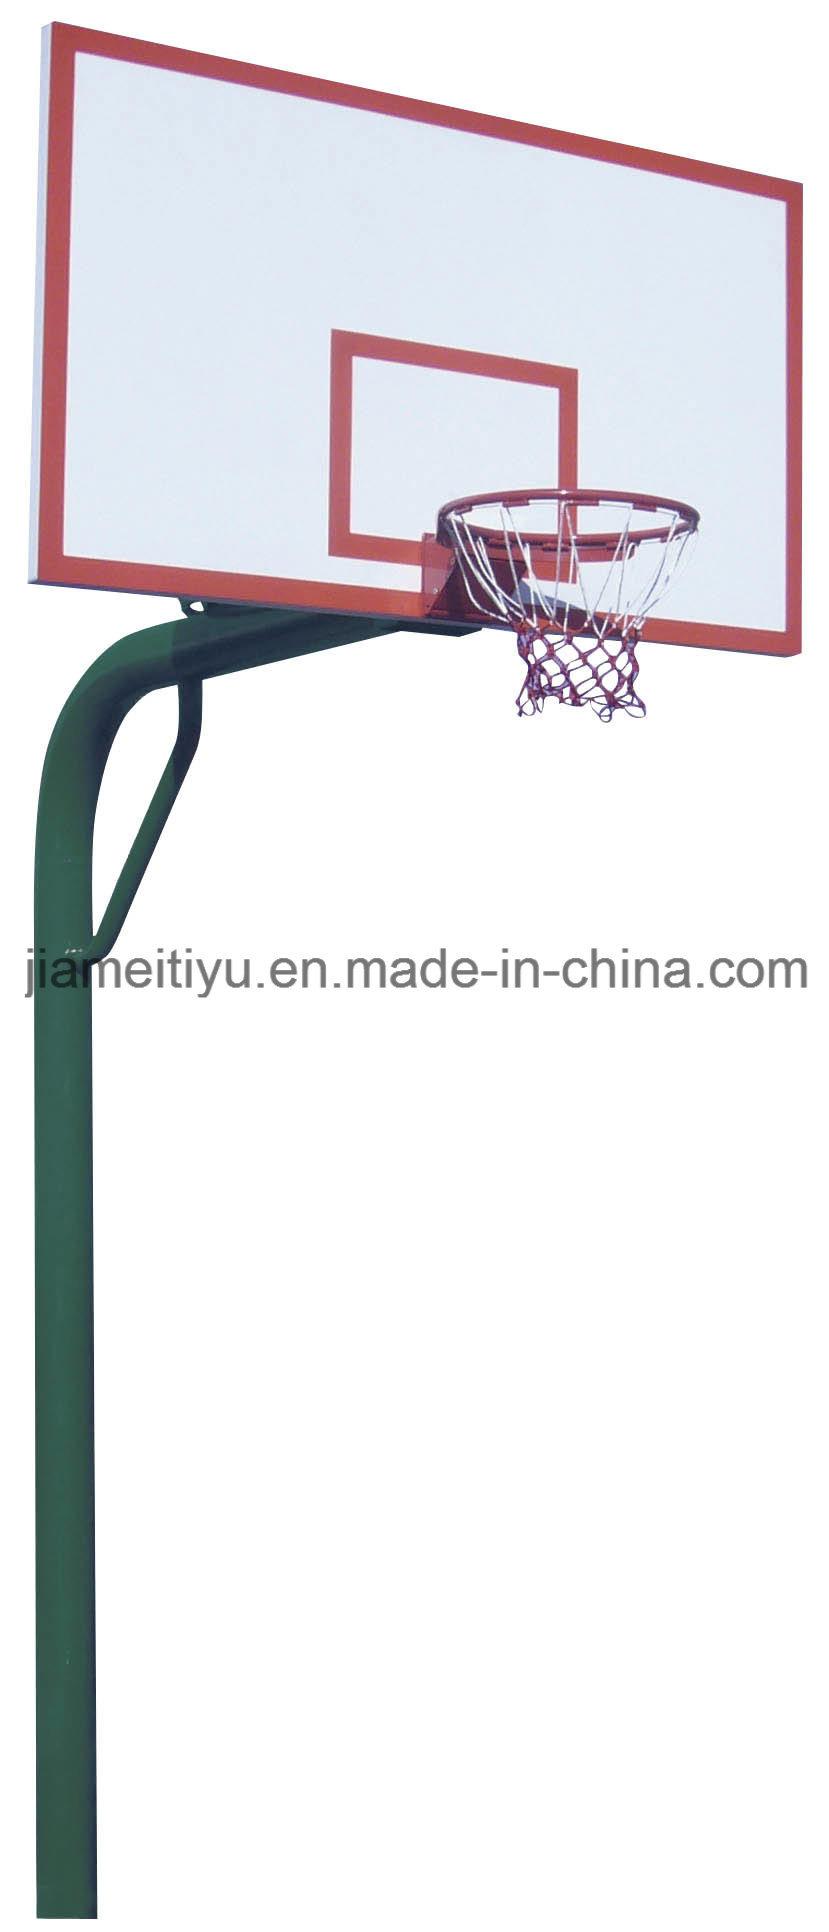 Professional Playground Equipment Basketball Stand Jm-1012xo